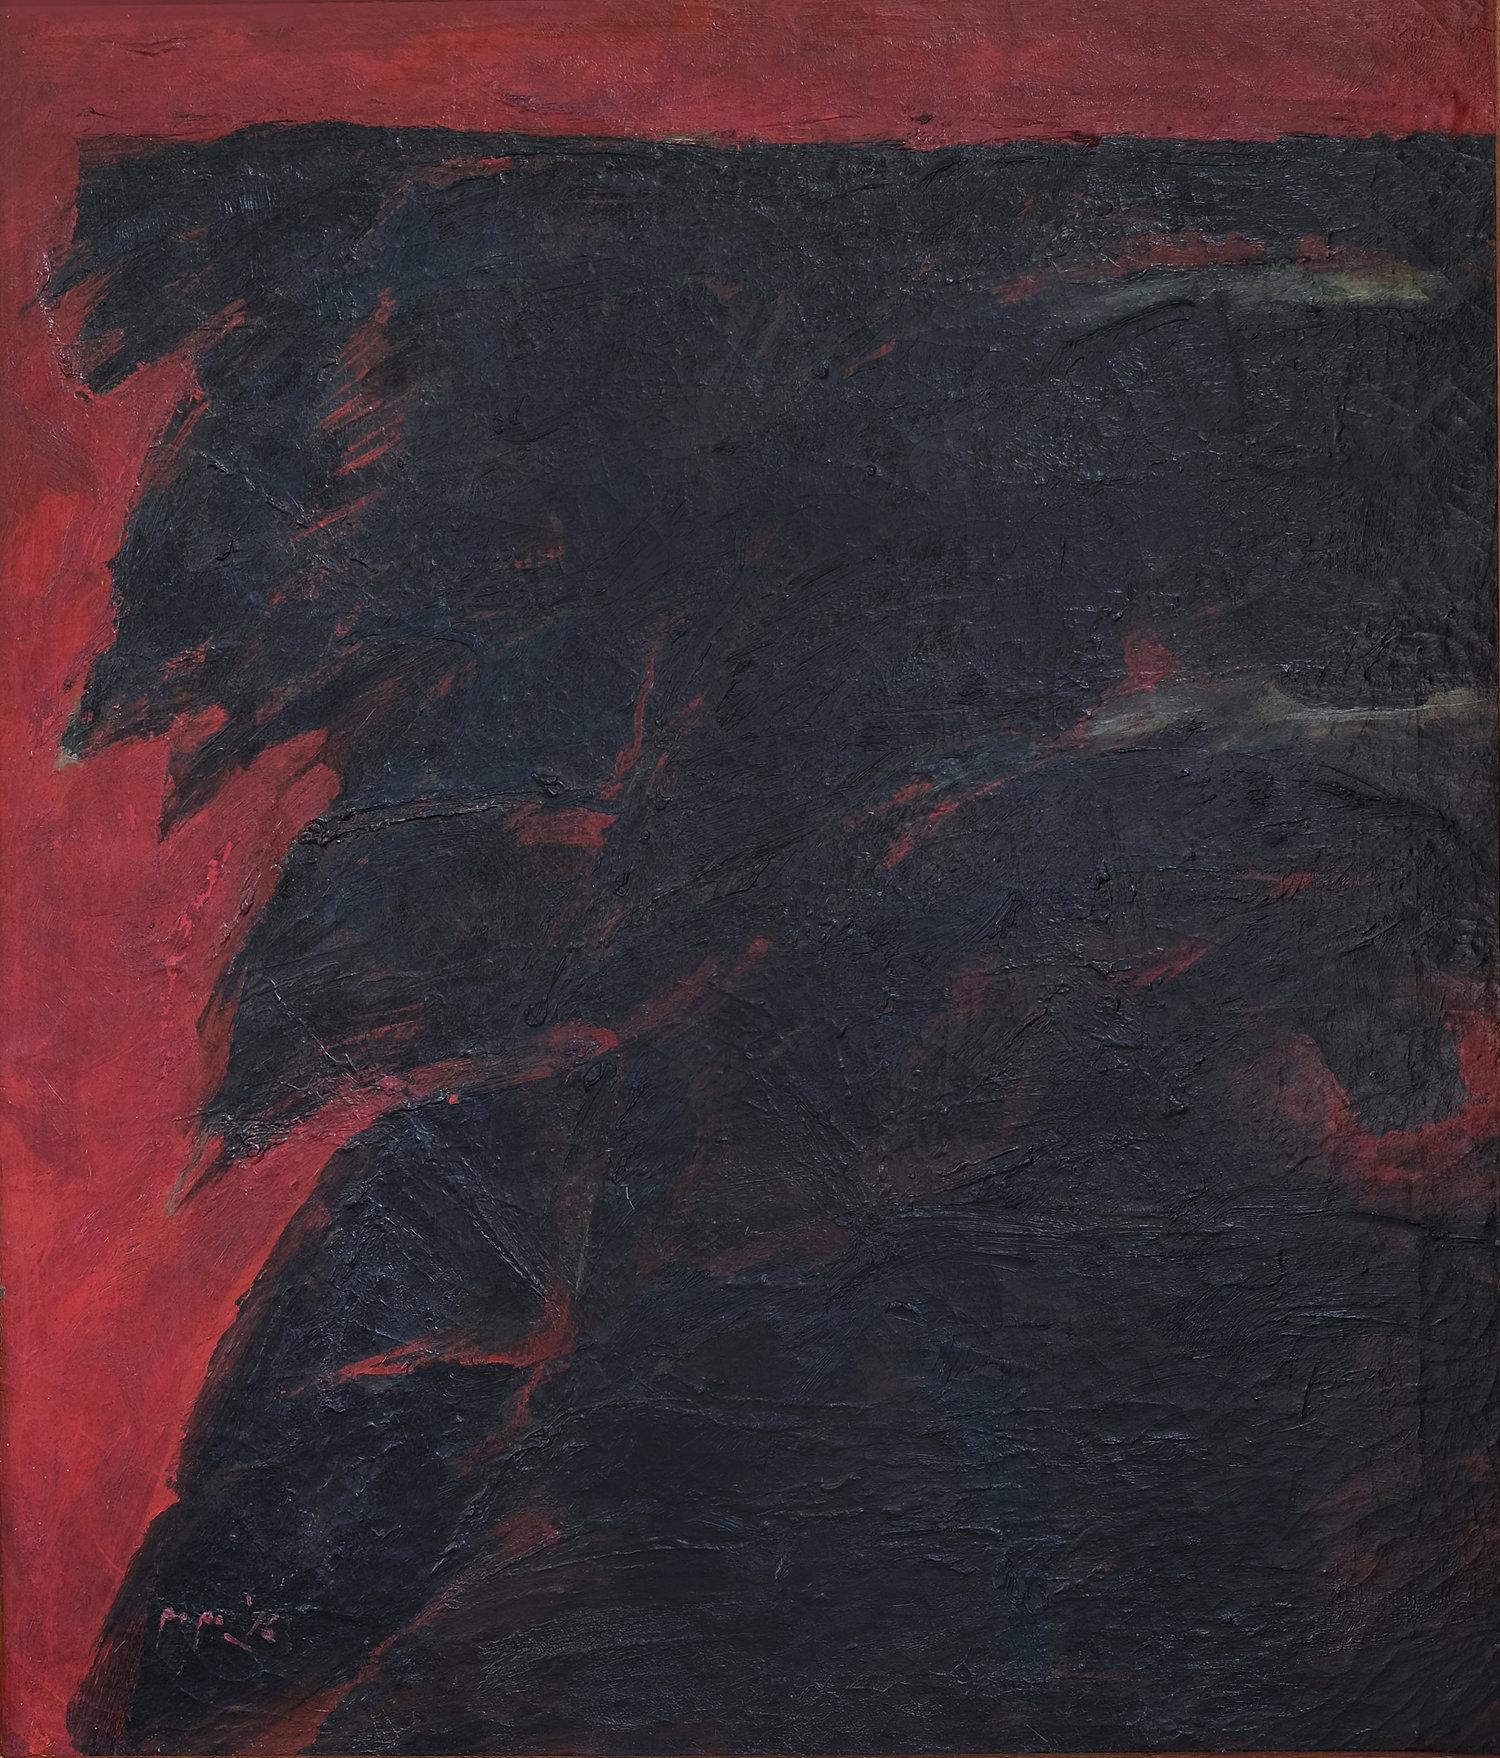 Popo Iskandar, Cahaya dicelah Kabut Pagi (Dawn Peeking behind the Morning Fog), oil on canvas, 70 x 60 cm, 1976